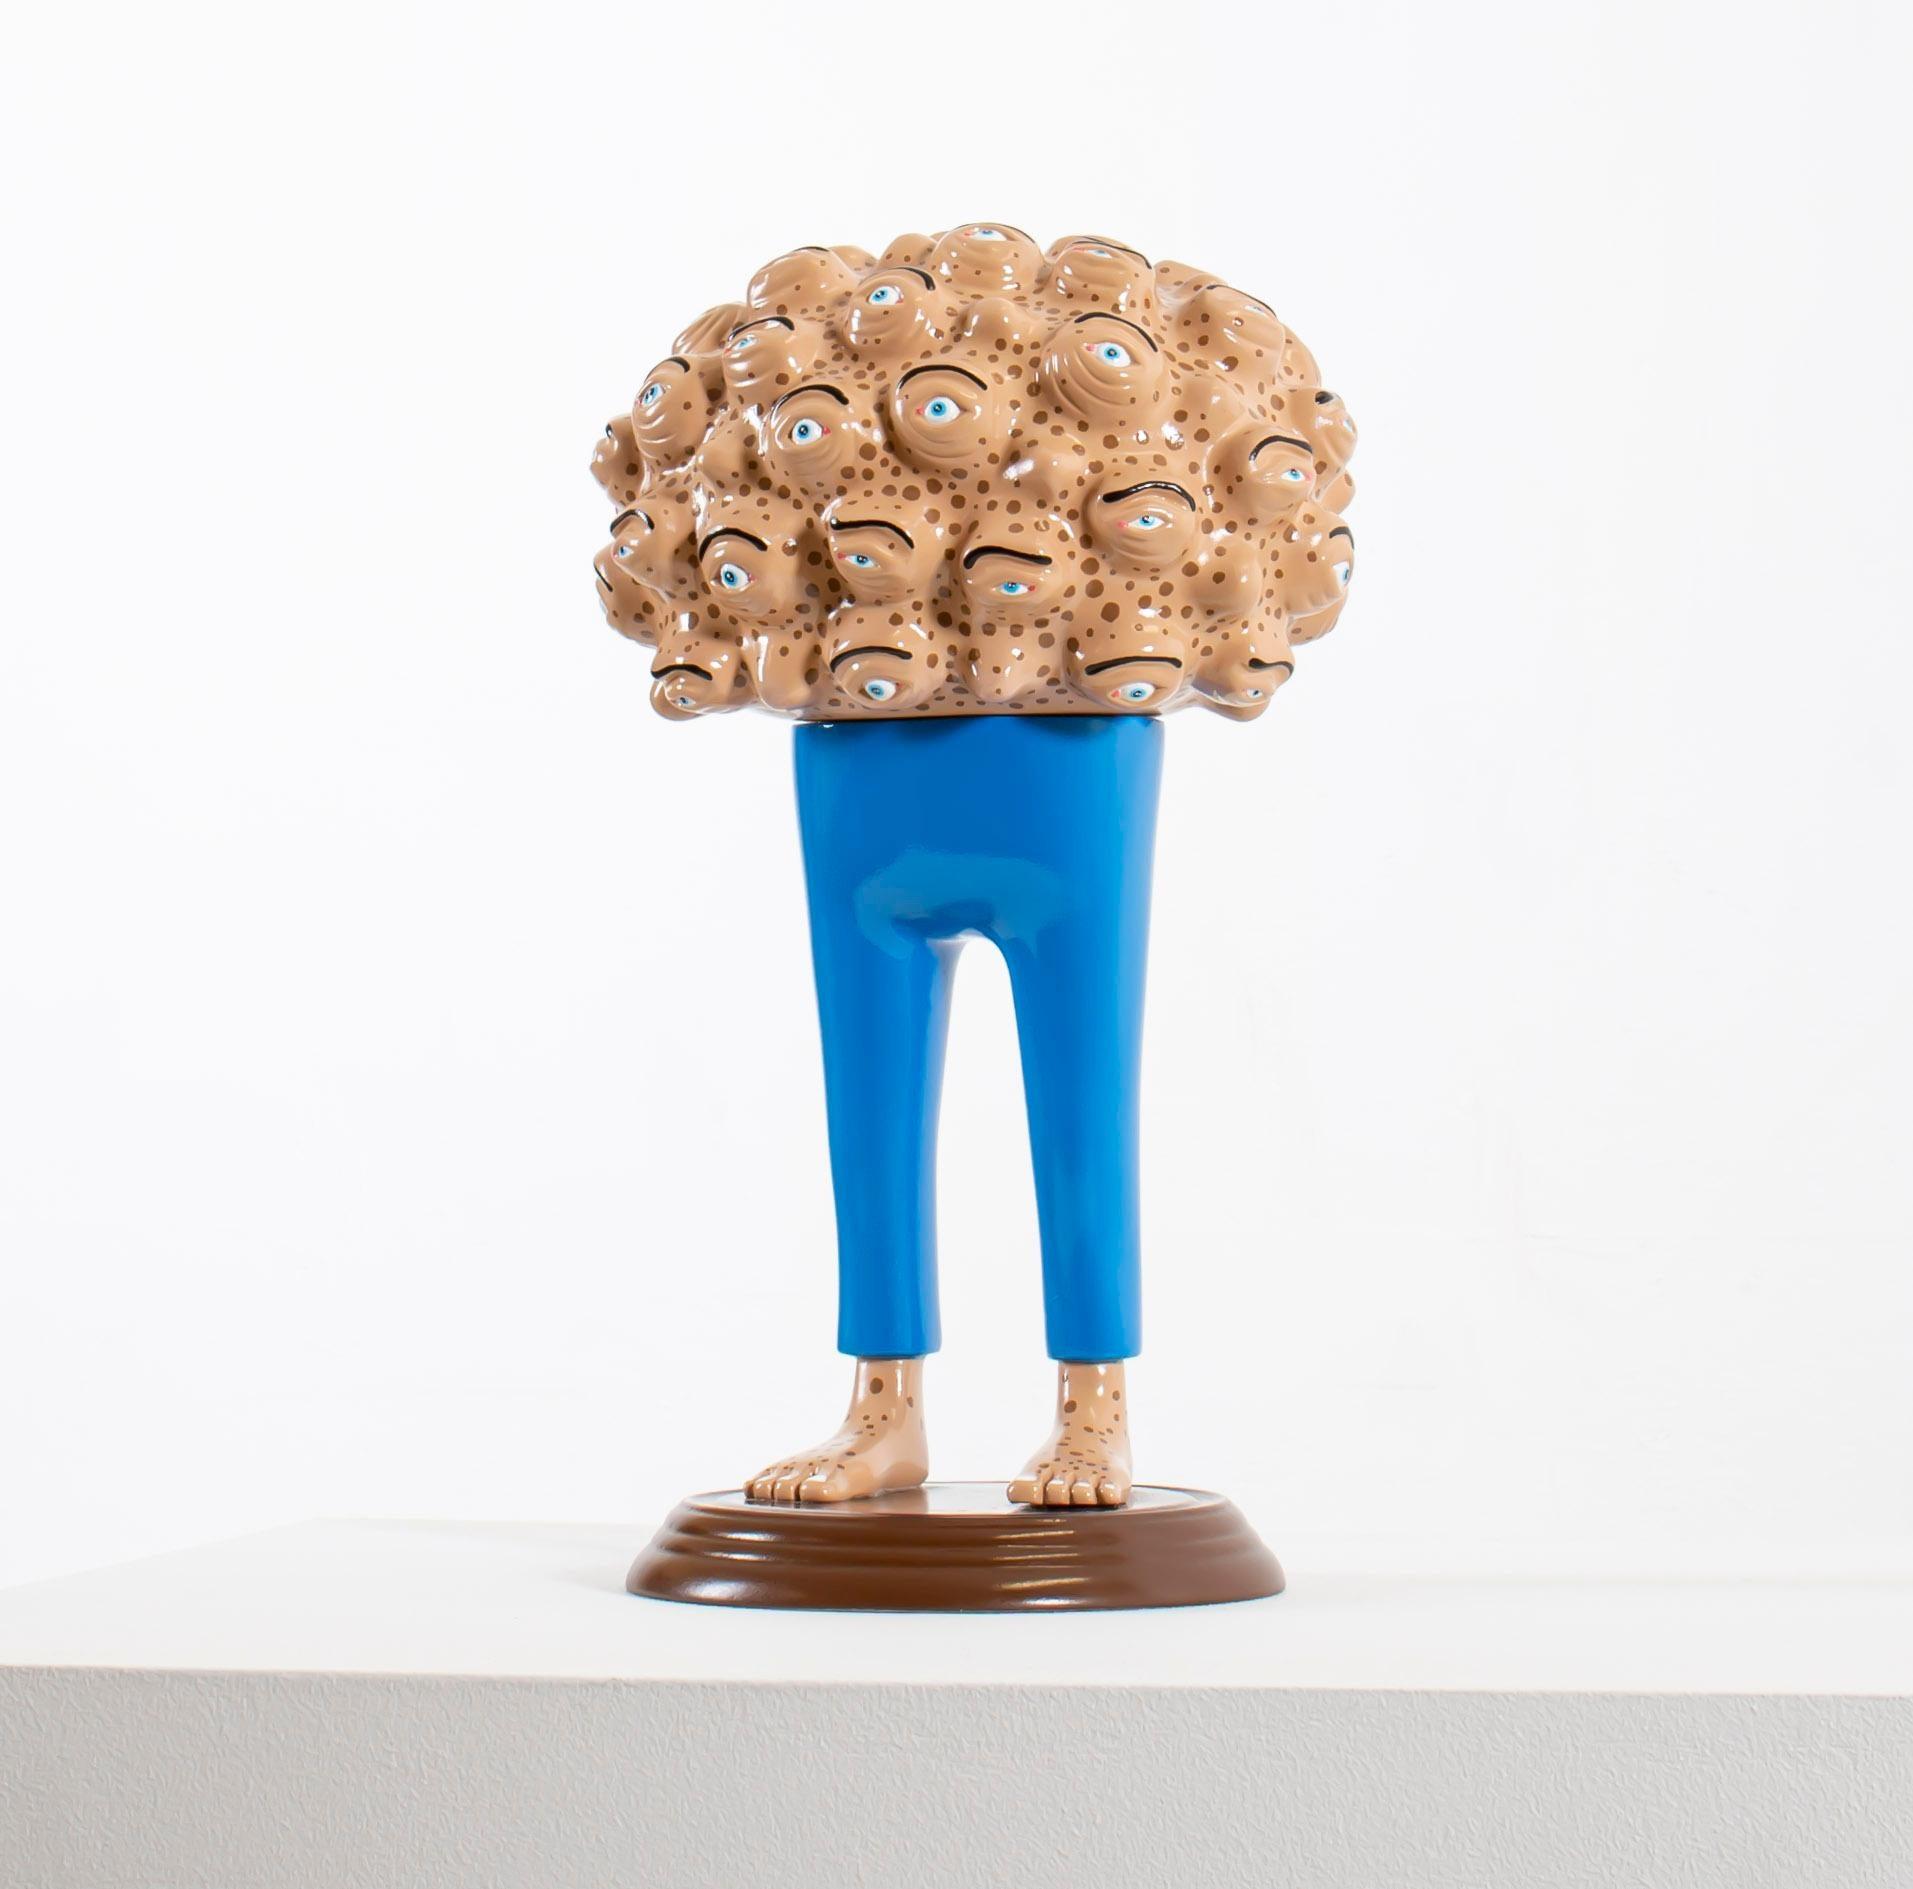 «Eyes of observation» Figurative Sculpture by Norwegian artist Jim Darbu